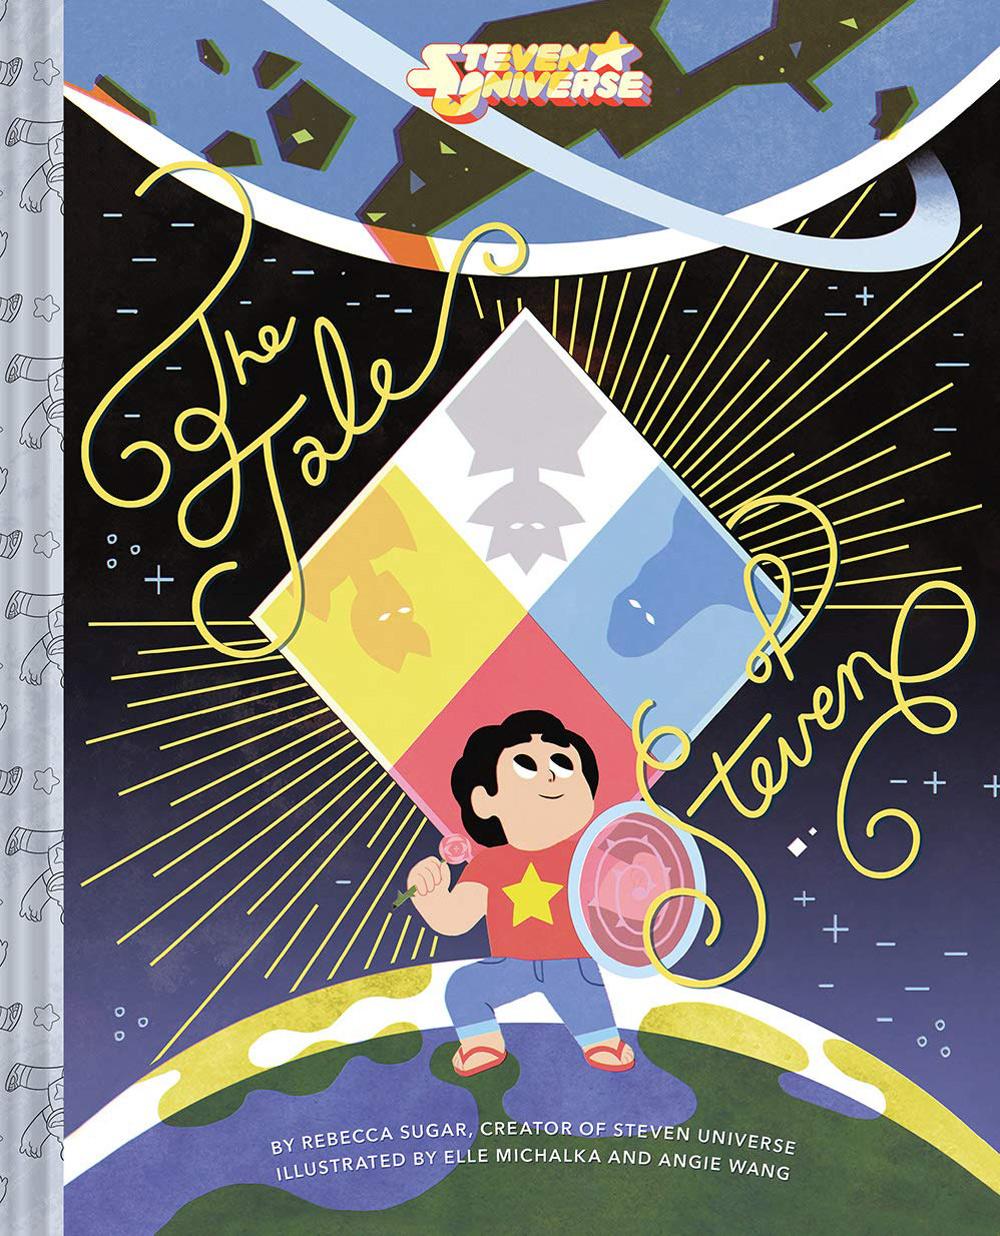 Steven Universe: Tale of Seven